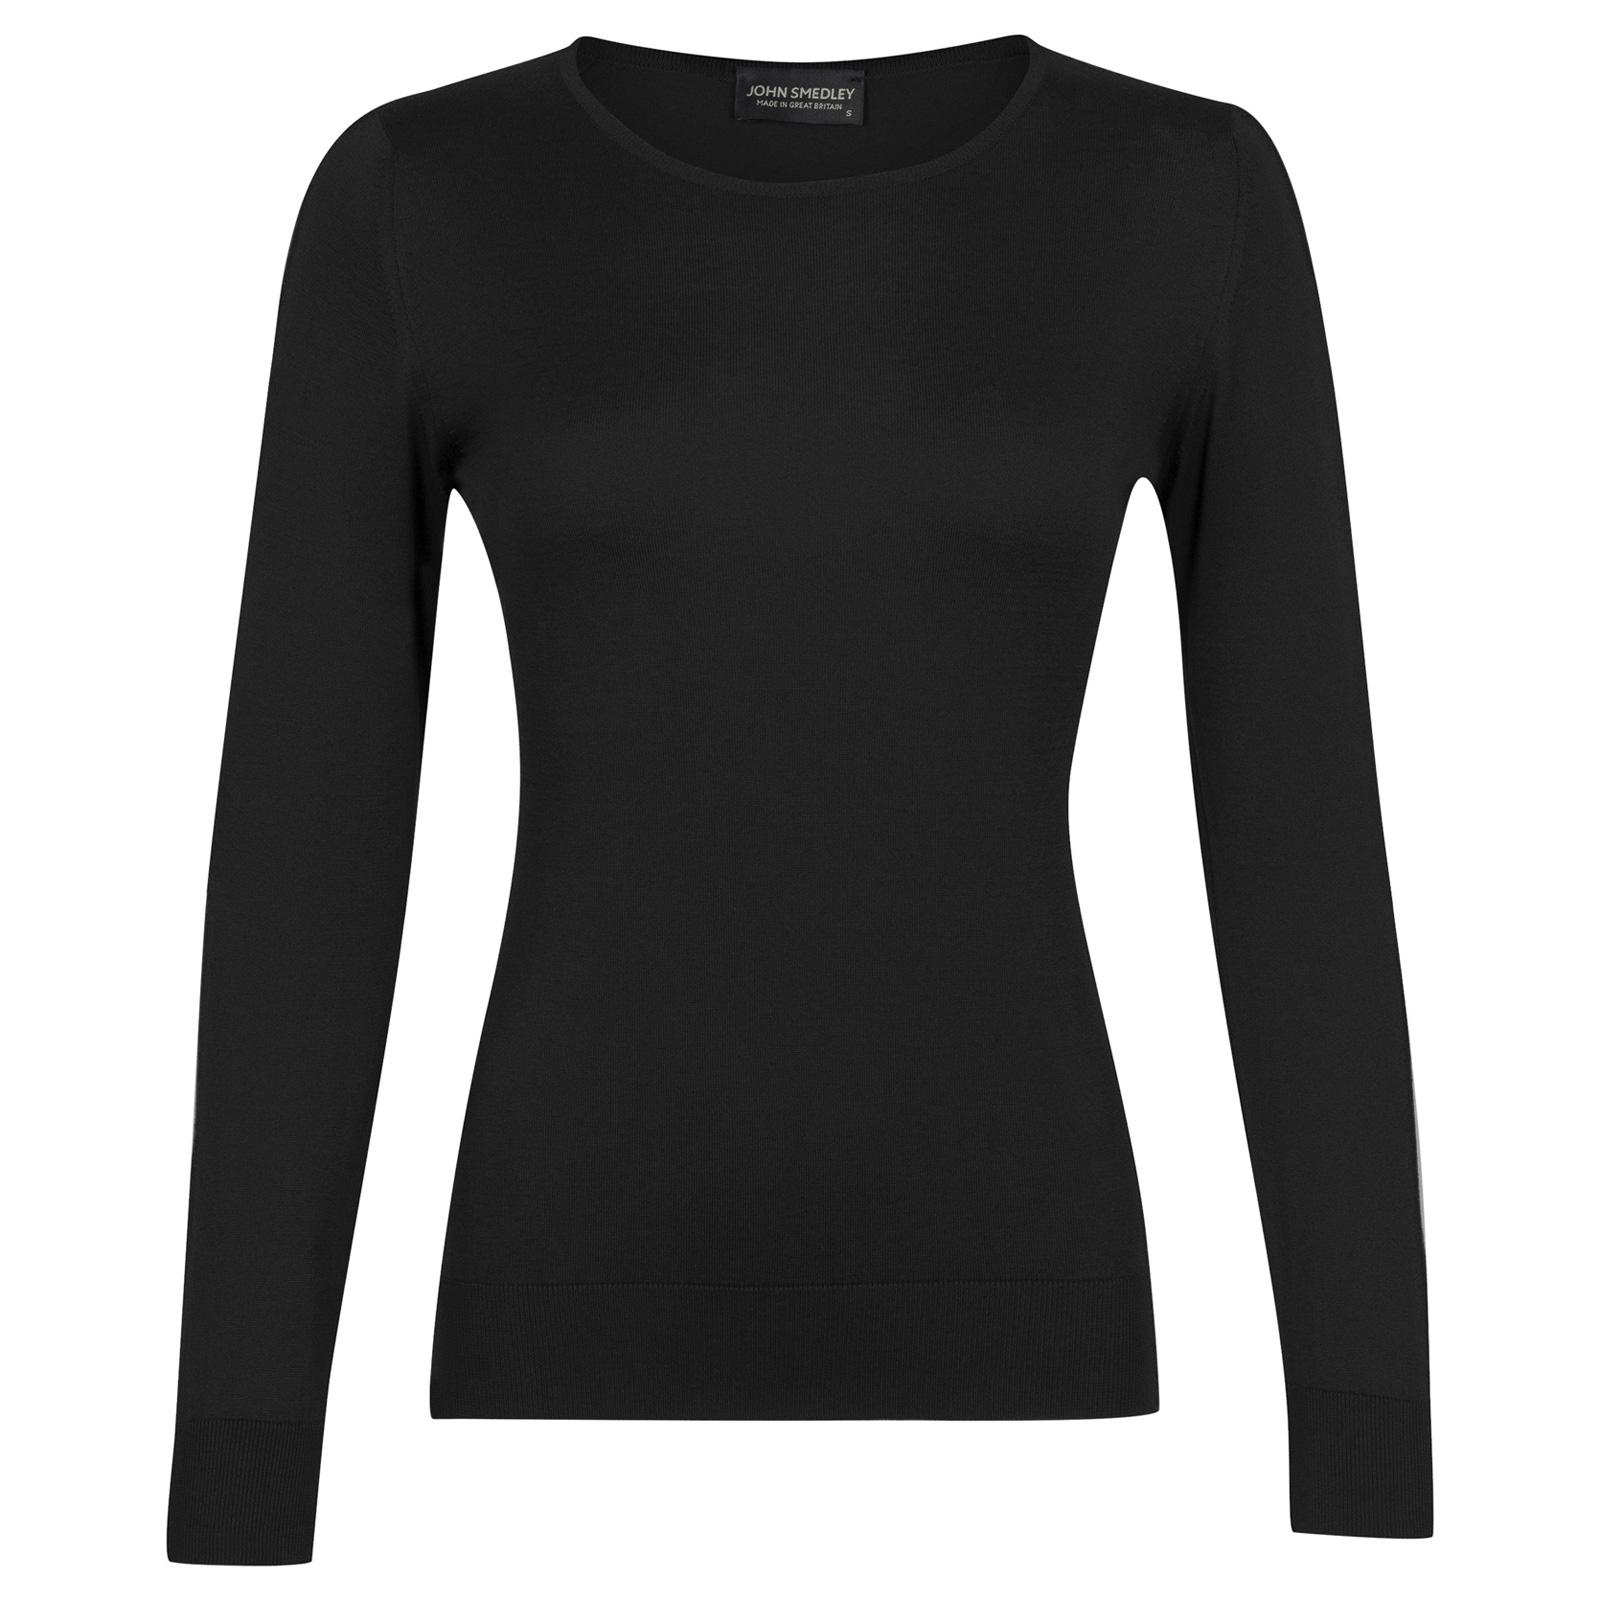 John Smedley paddington Sea Island Cotton Sweater in Black-M